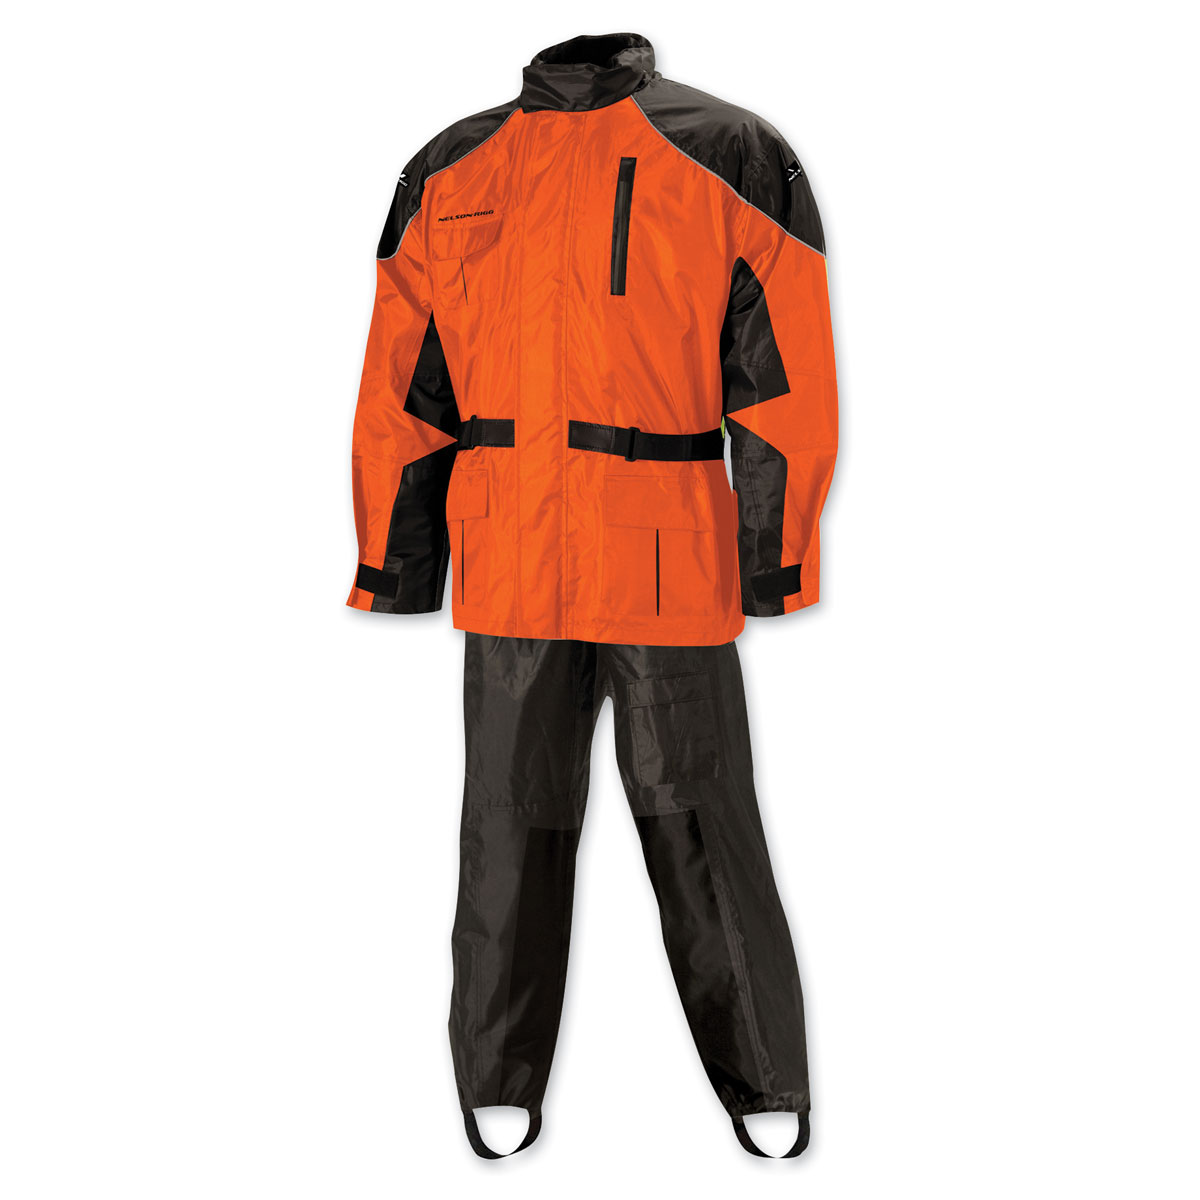 Nelson-Rigg AS-3000 Aston Hi-Viz Orange Rain Suit